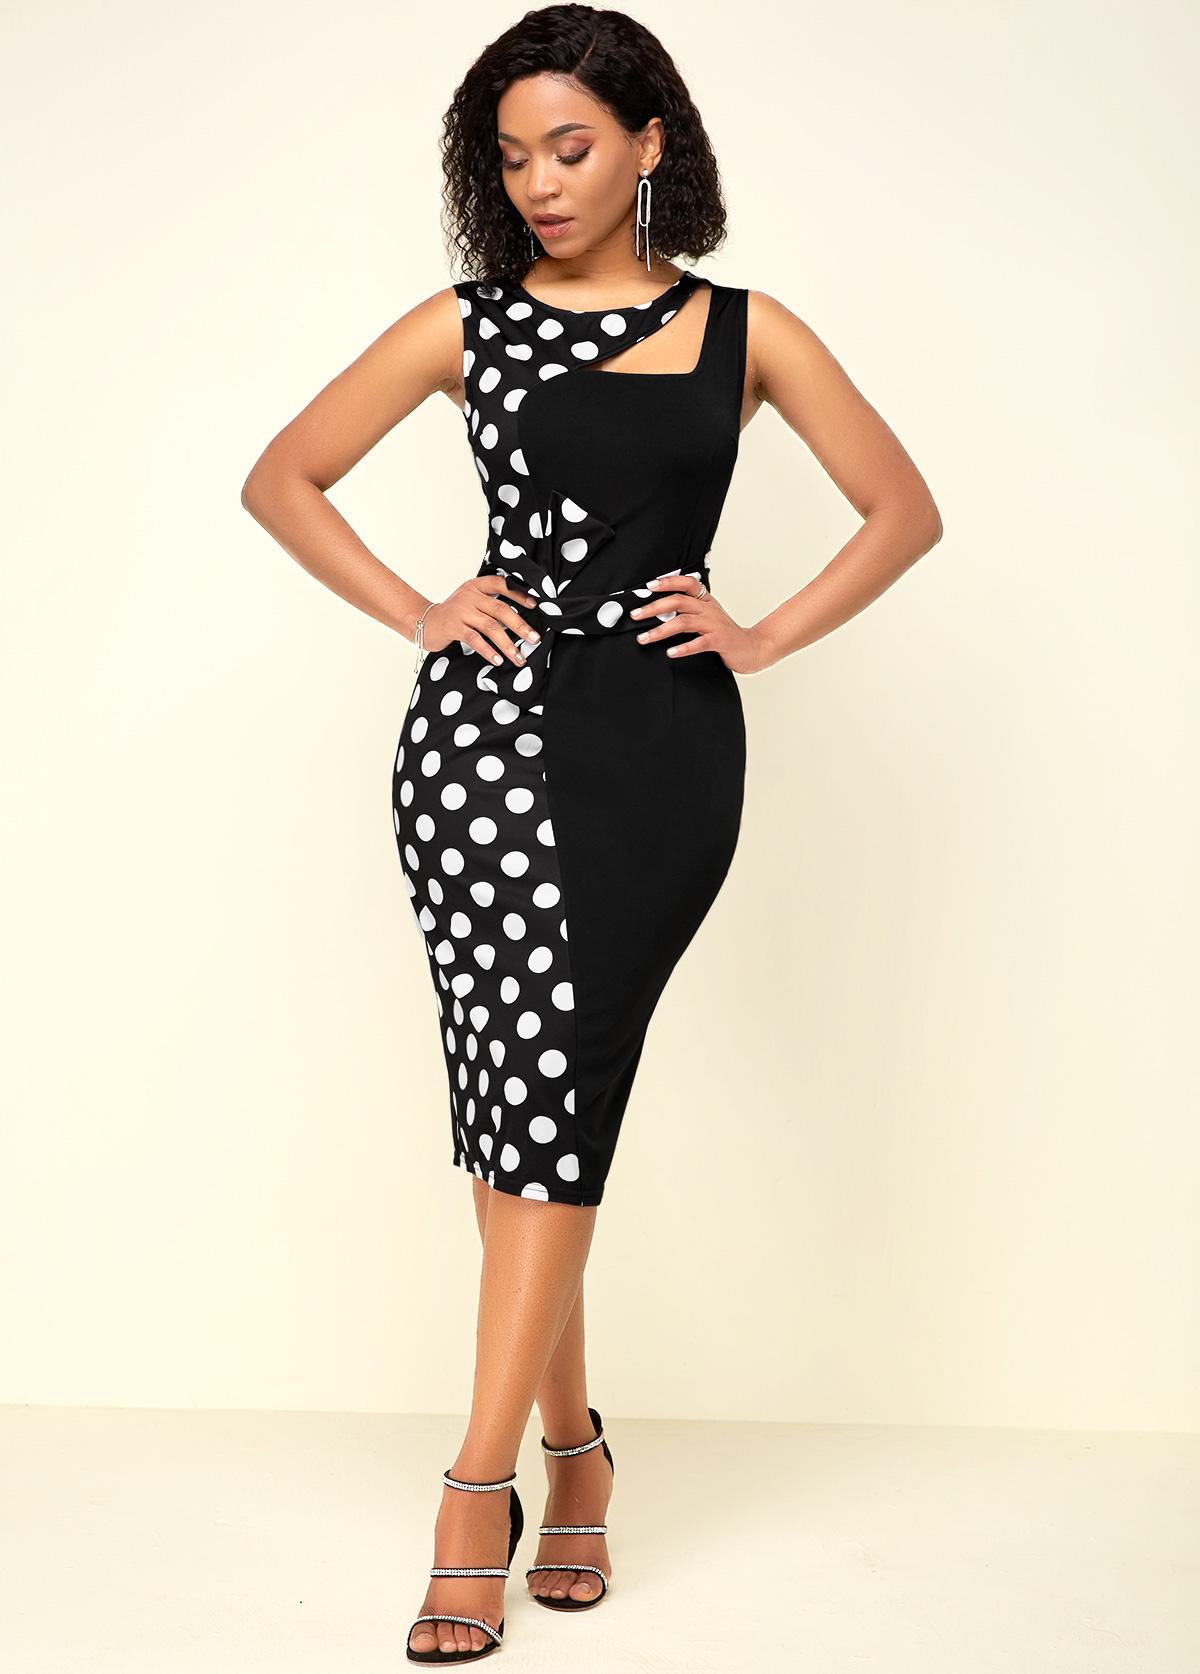 ROTITA Polka Dot Print Black High Waist Dress